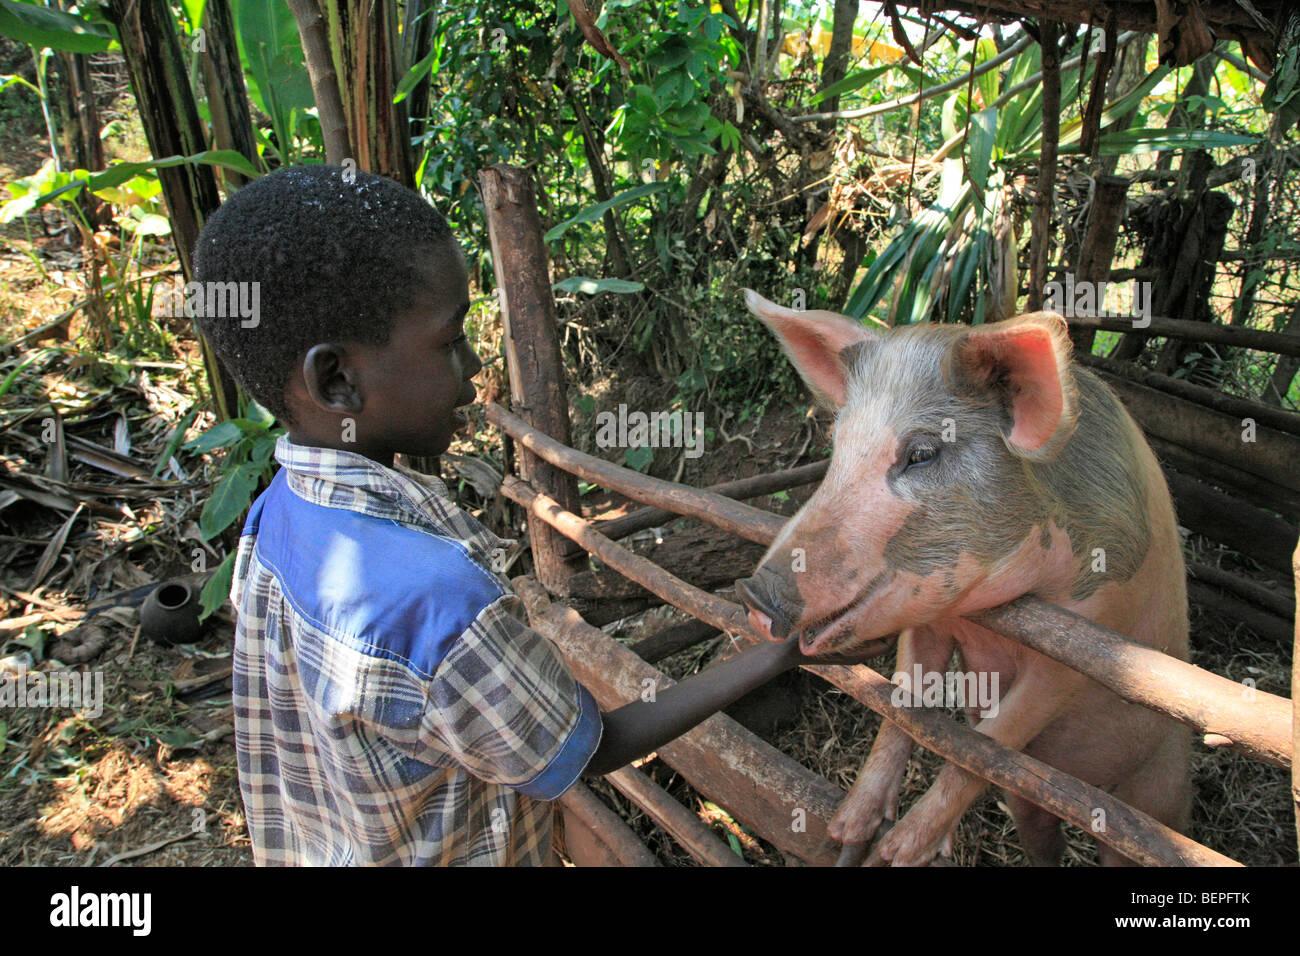 BURUNDI Boy with pig, Gitera. PHOTOGRAPH by Sean Sprague 2009 - Stock Image